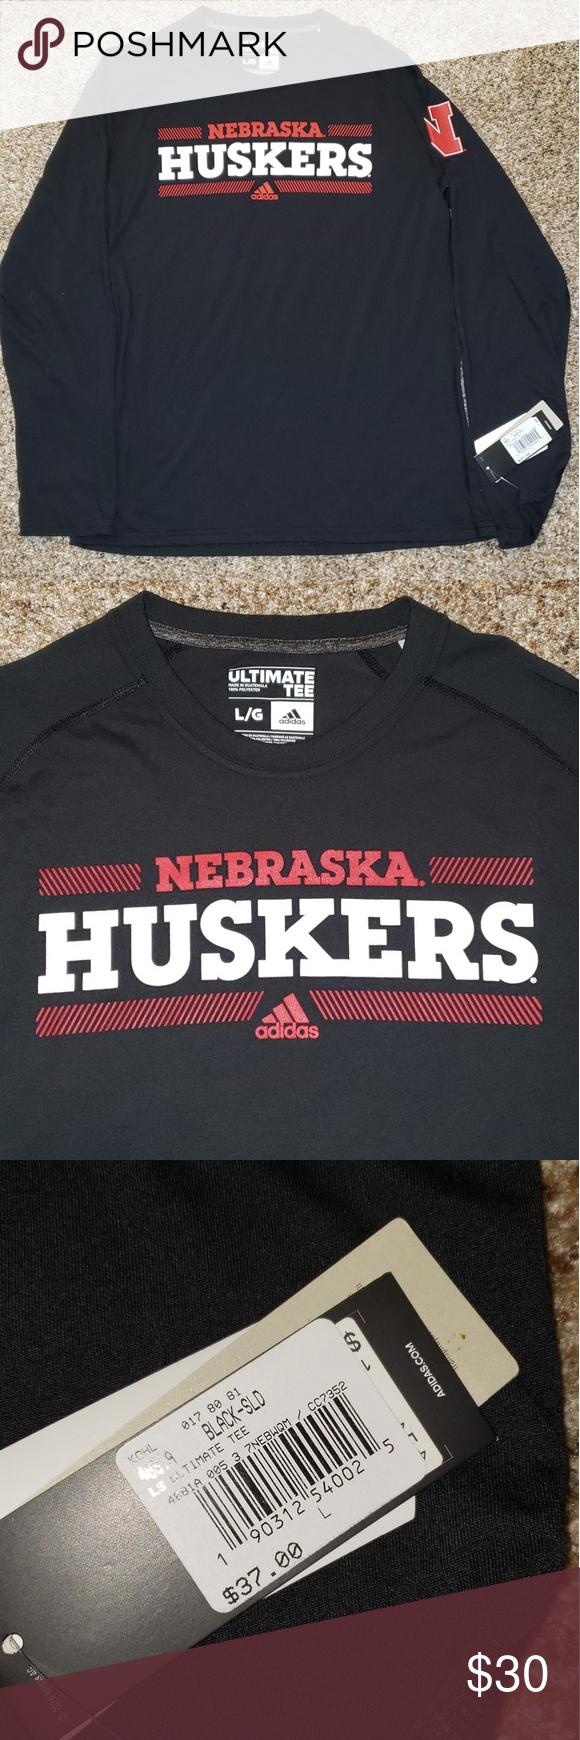 Men S Adidas Nebraska Huskers Black L S Top Adidas Men Long Sleeve Tshirt Men Tops [ 1740 x 580 Pixel ]